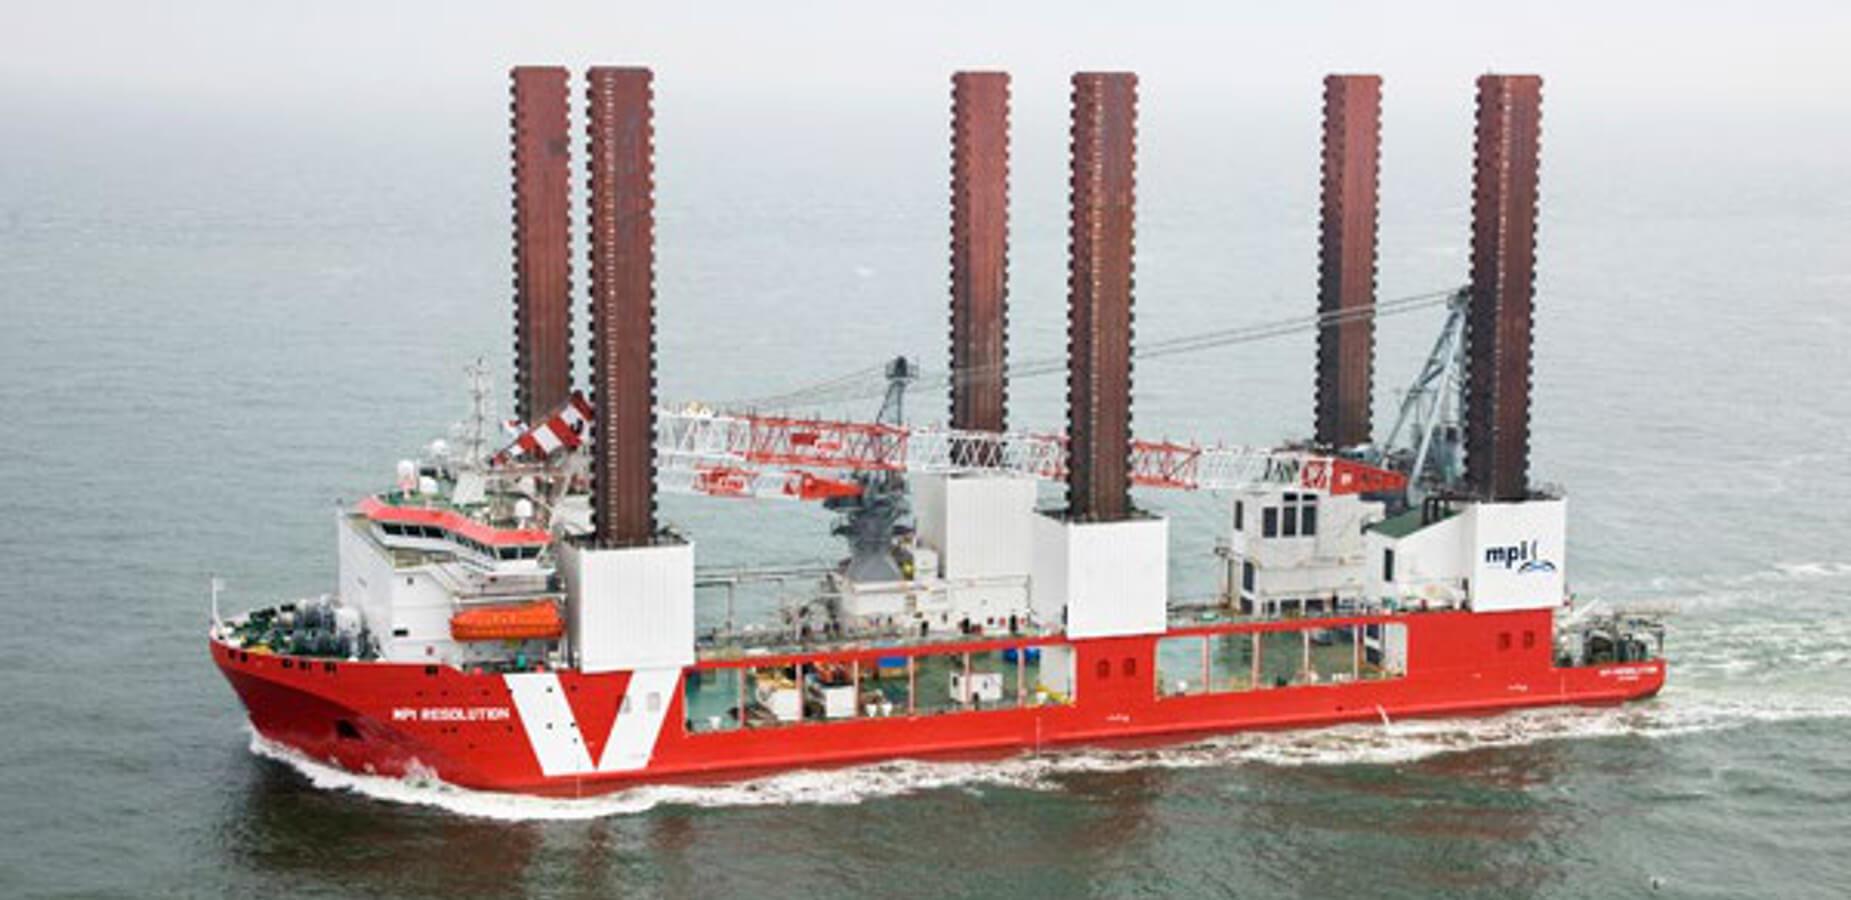 Design Of Offshore Wind Turbines Installation Vessel Mpi